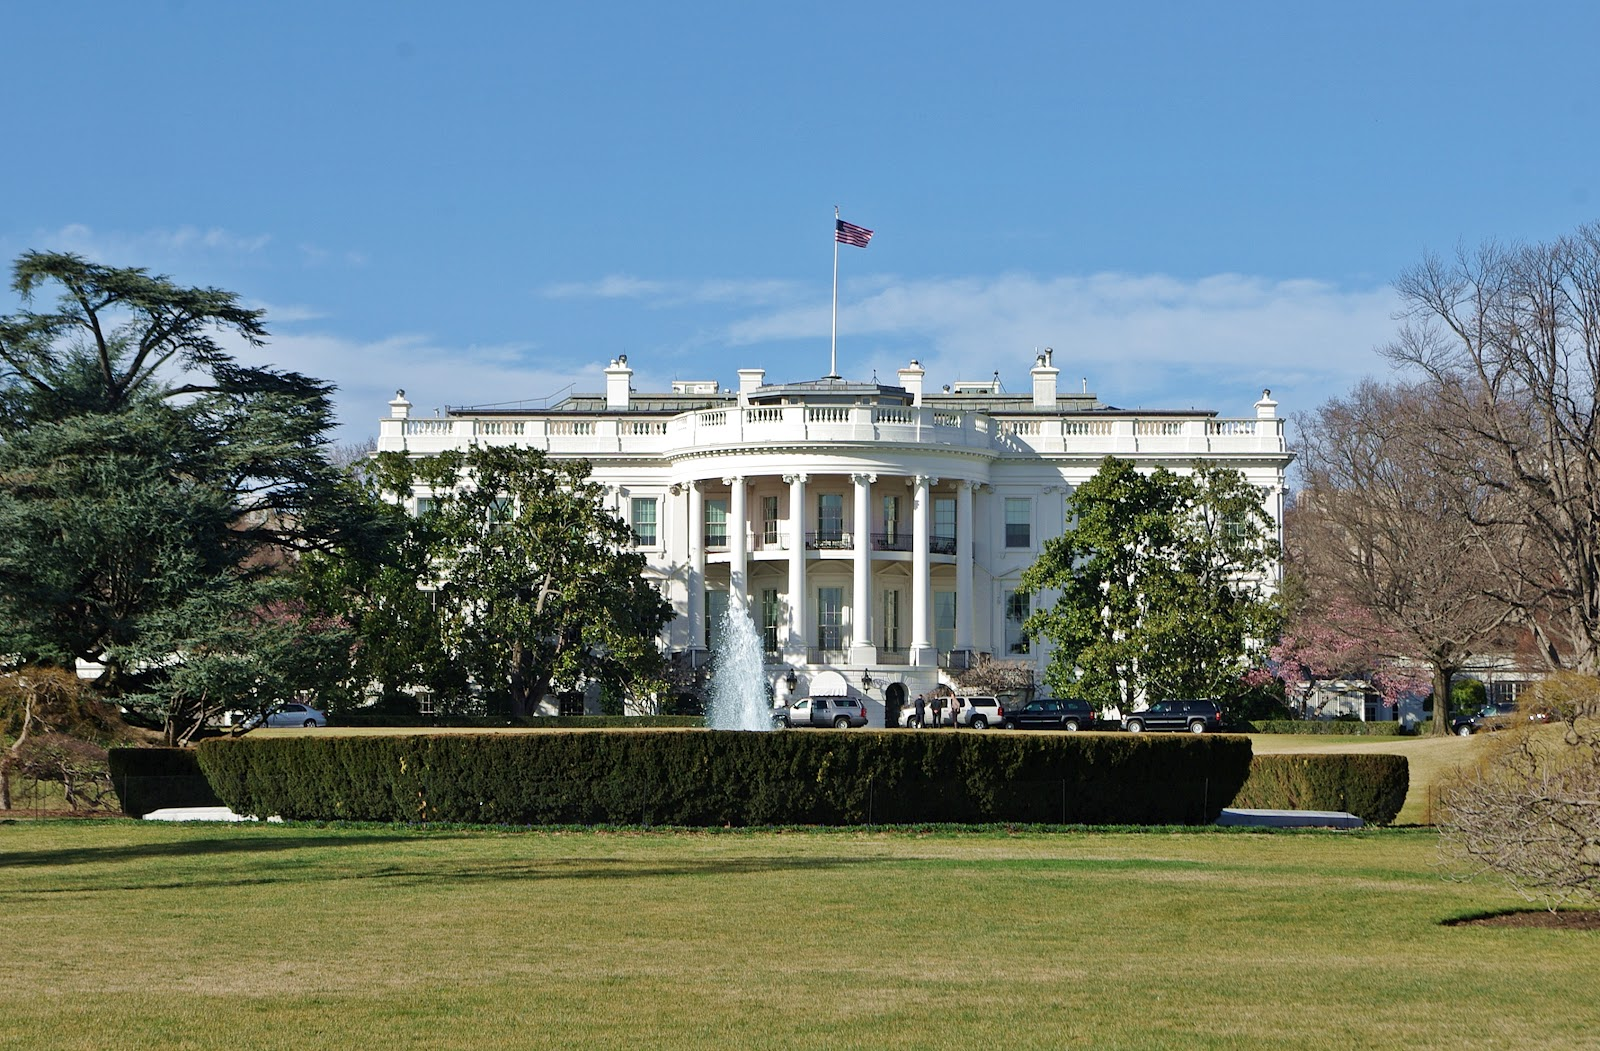 weltb hne washington dc part 4 white house. Black Bedroom Furniture Sets. Home Design Ideas